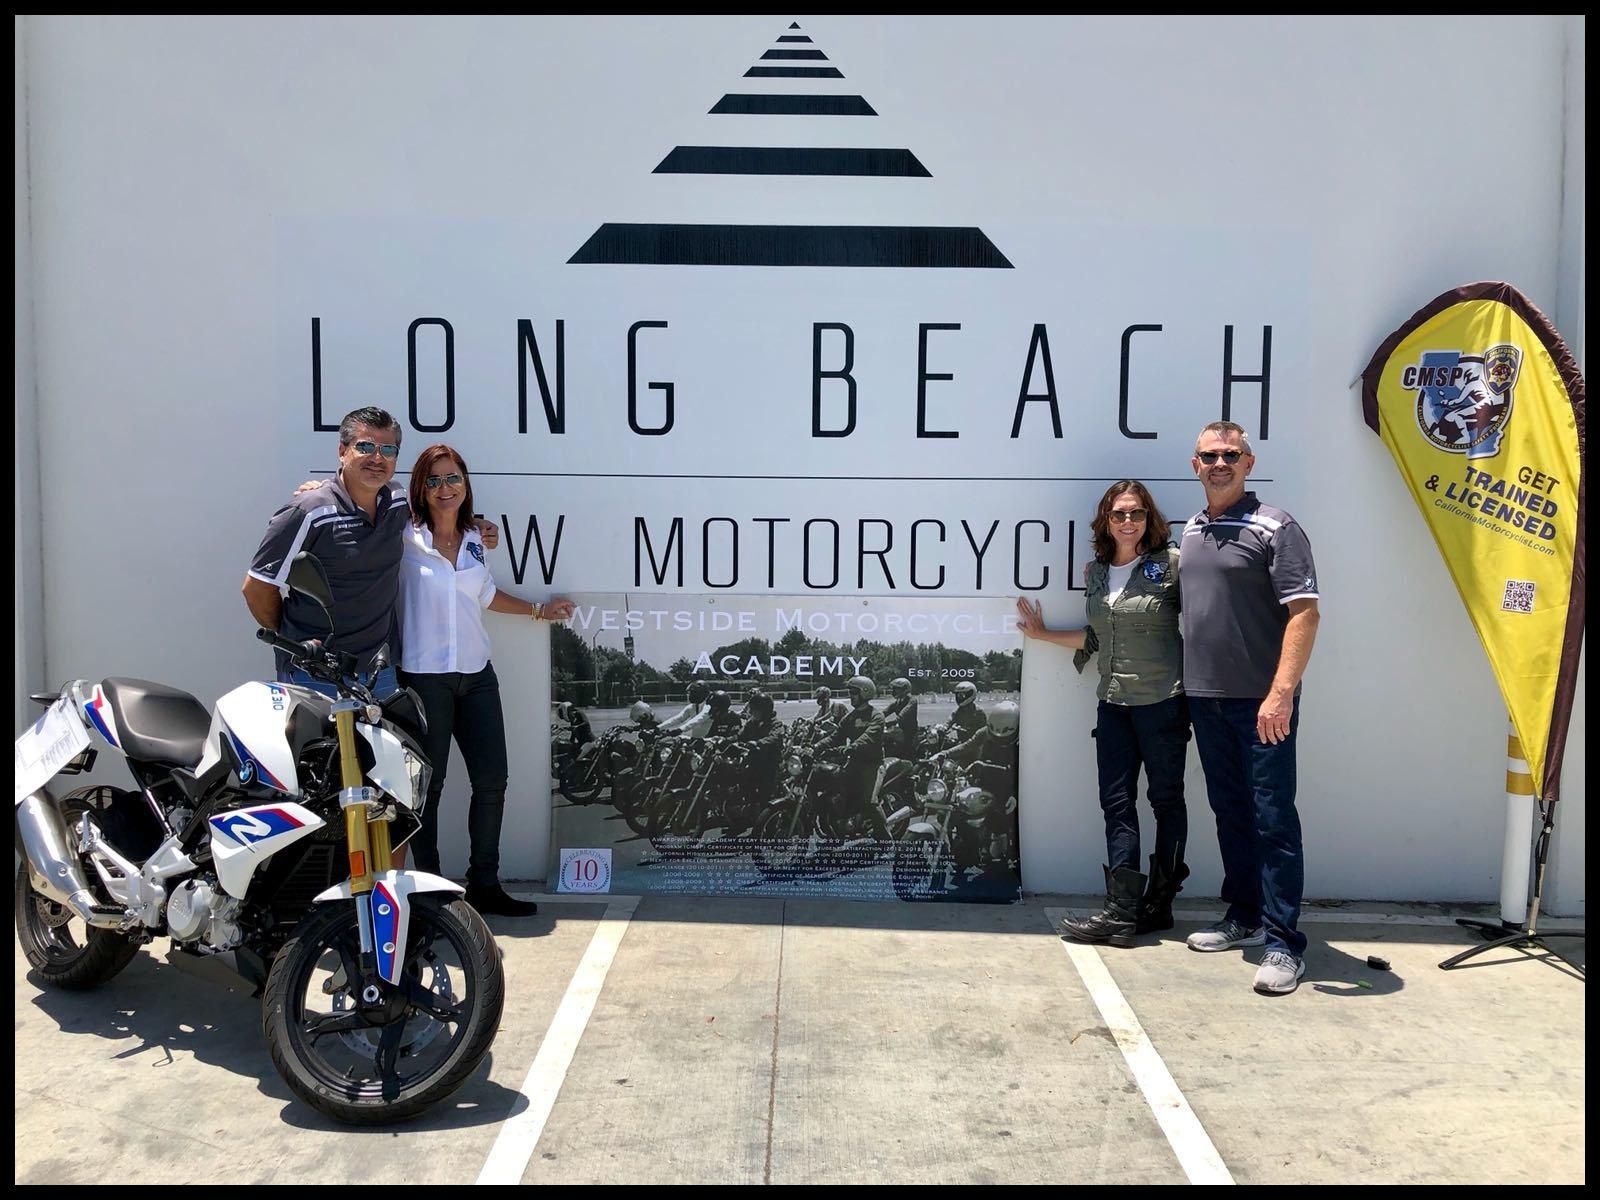 Westside Motorcycle Academy Long Beach BMW Motorcycles